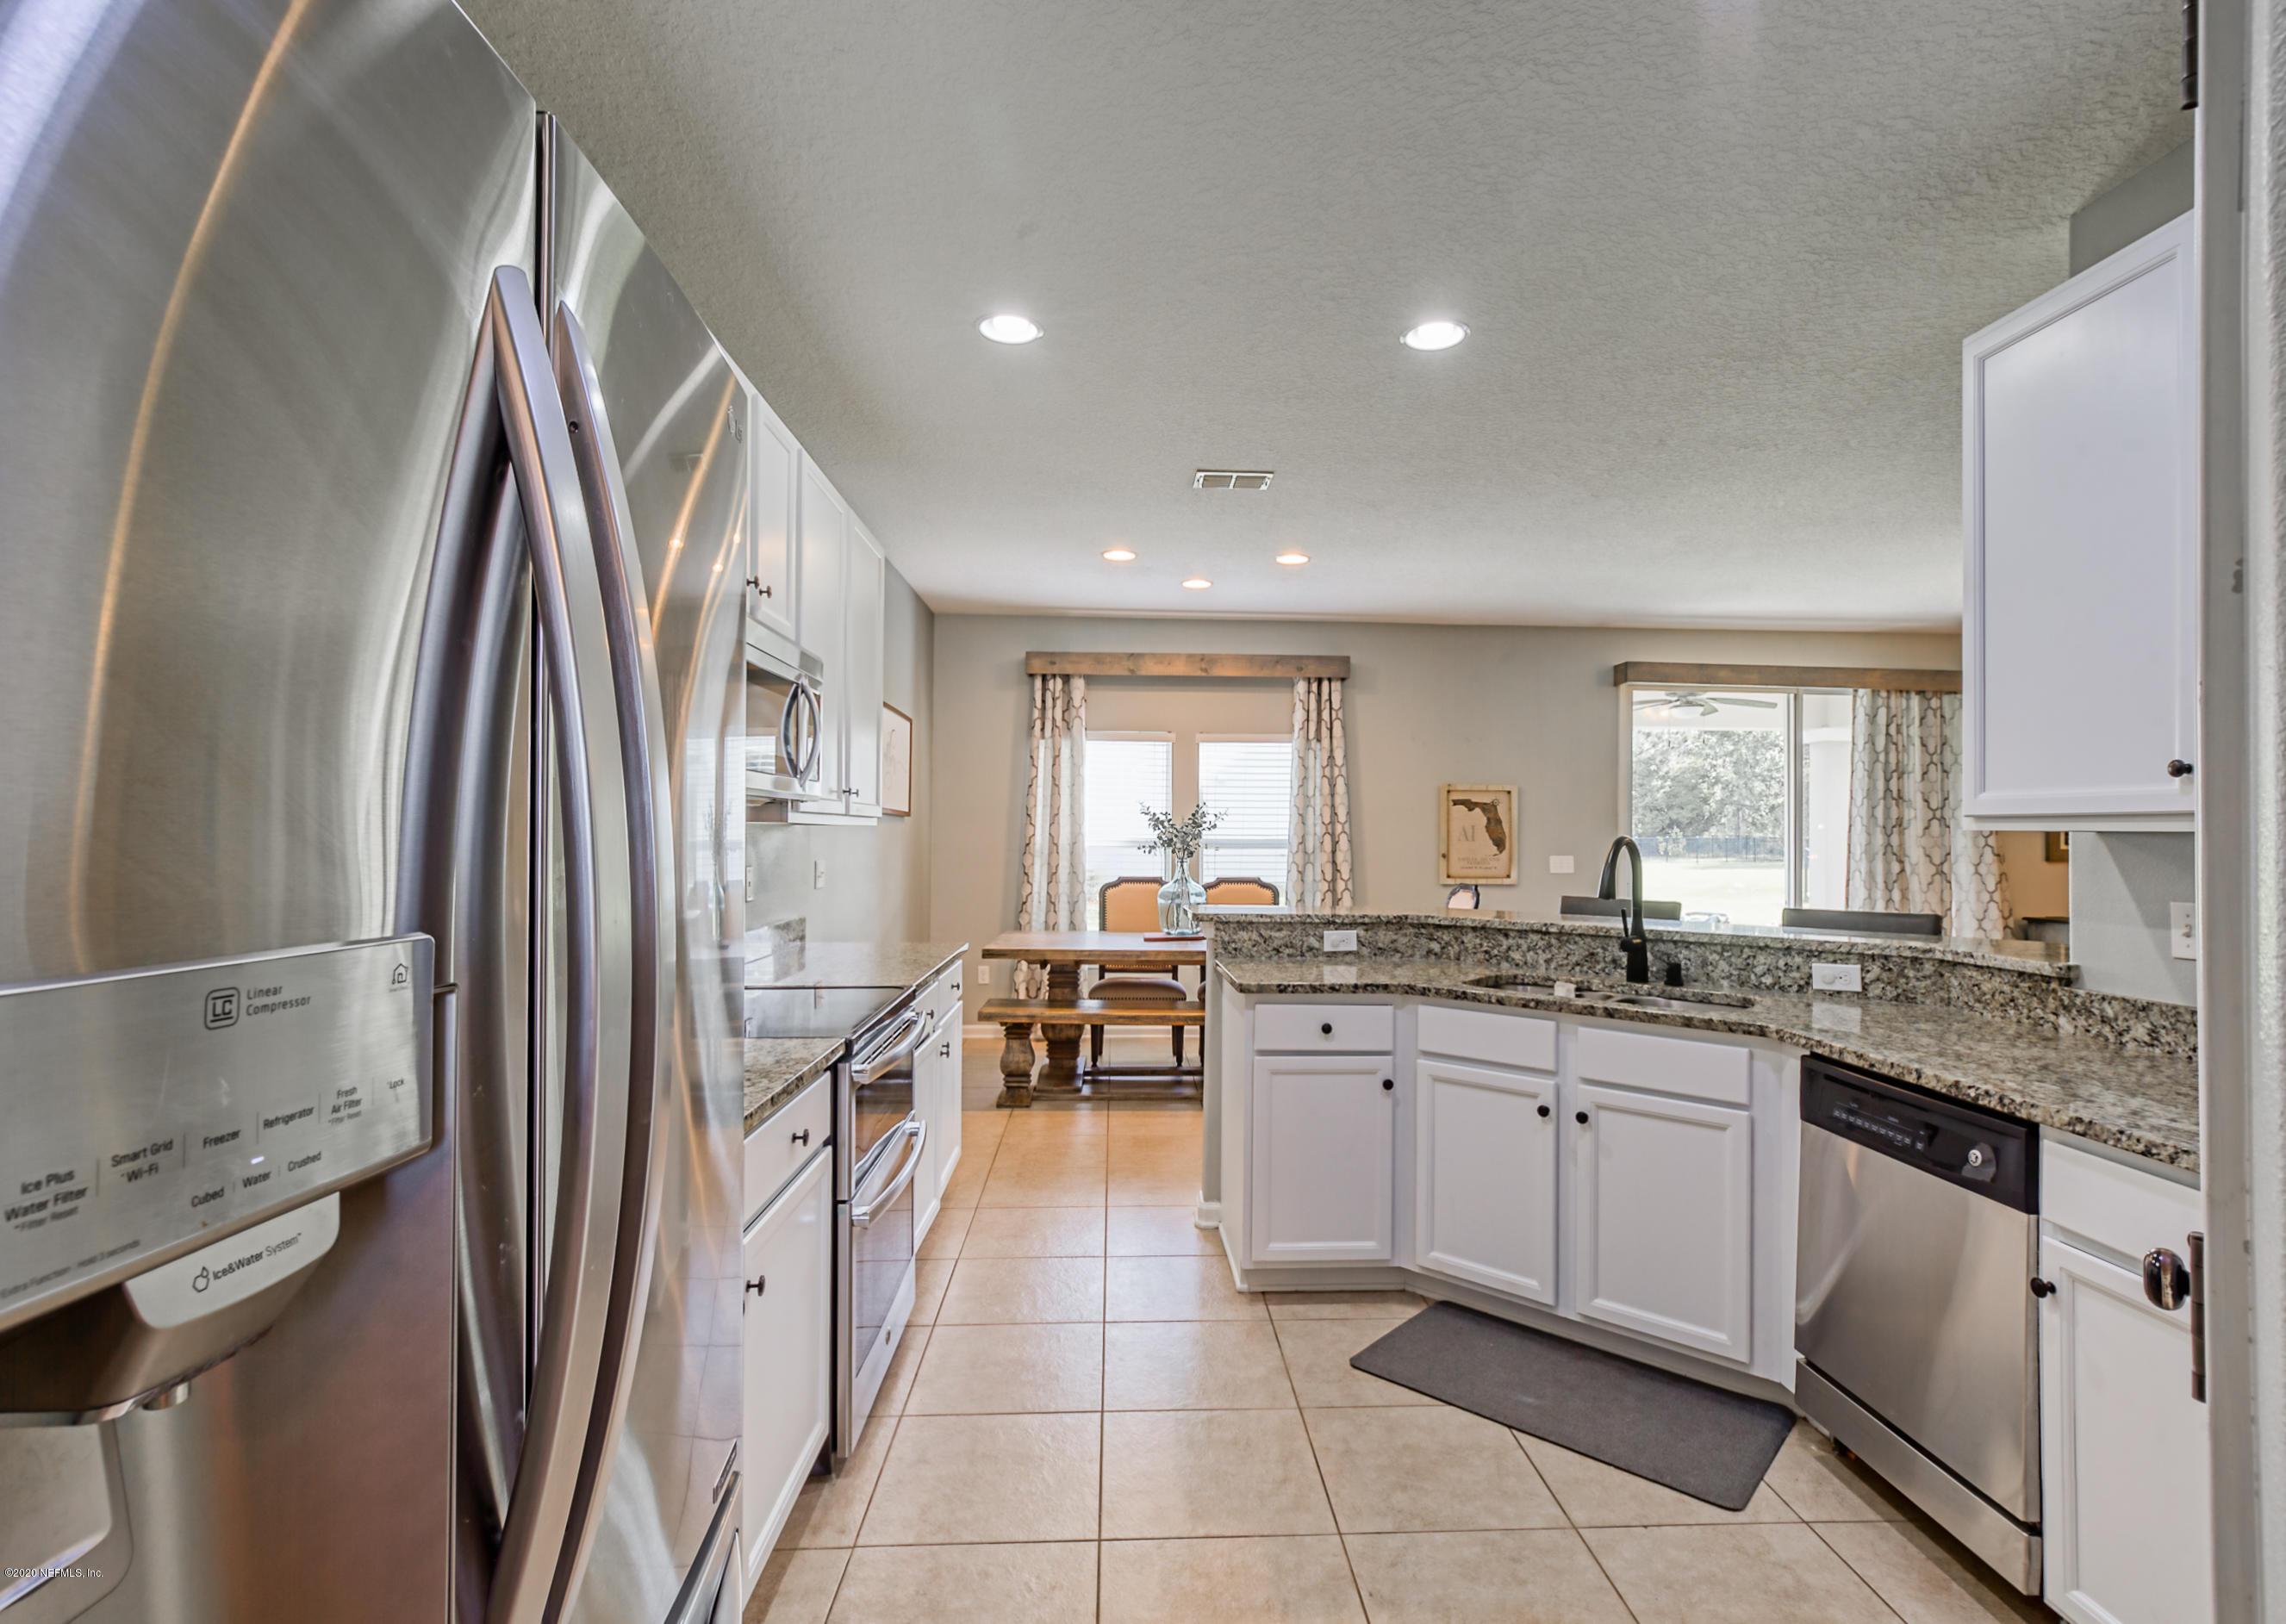 85095 CHAMPLAIN, FERNANDINA BEACH, FLORIDA 32034, 4 Bedrooms Bedrooms, ,3 BathroomsBathrooms,Residential,For sale,CHAMPLAIN,1070573